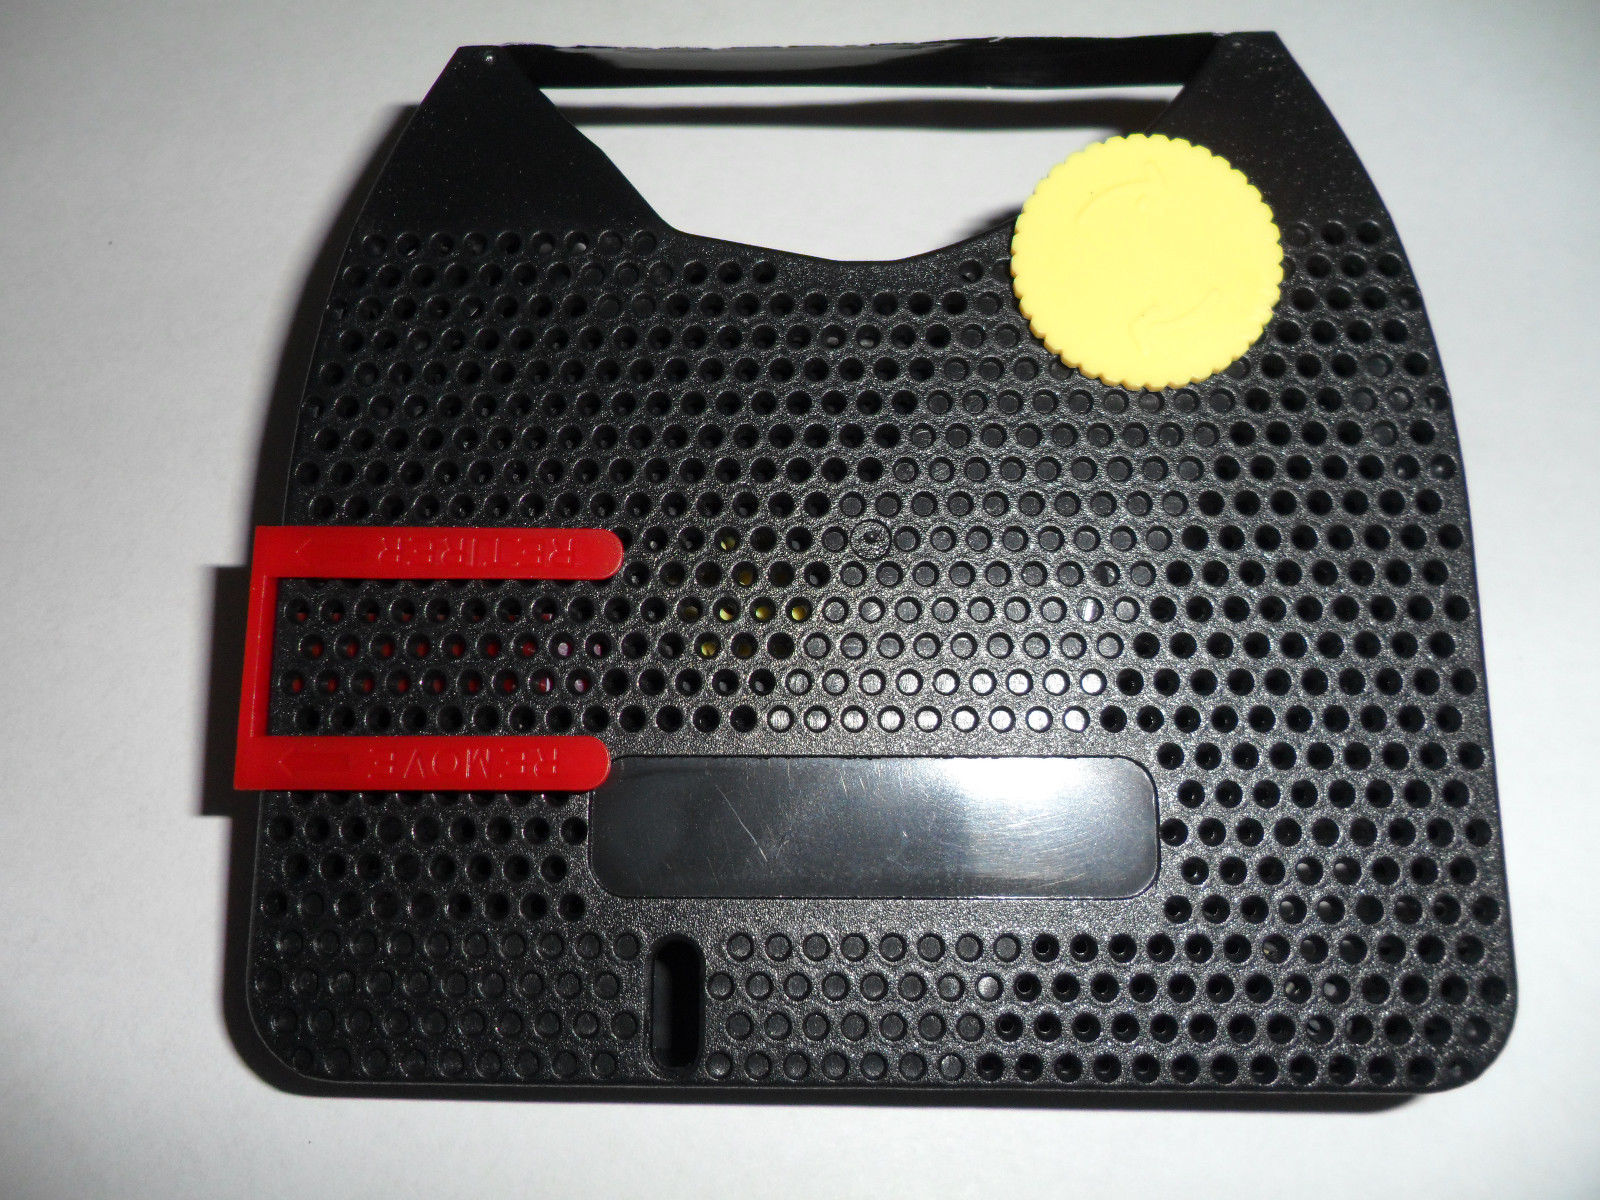 Smith Corona Mark VI Mark VII Typewriter Ribbon (2 Pack) Replaces 21000